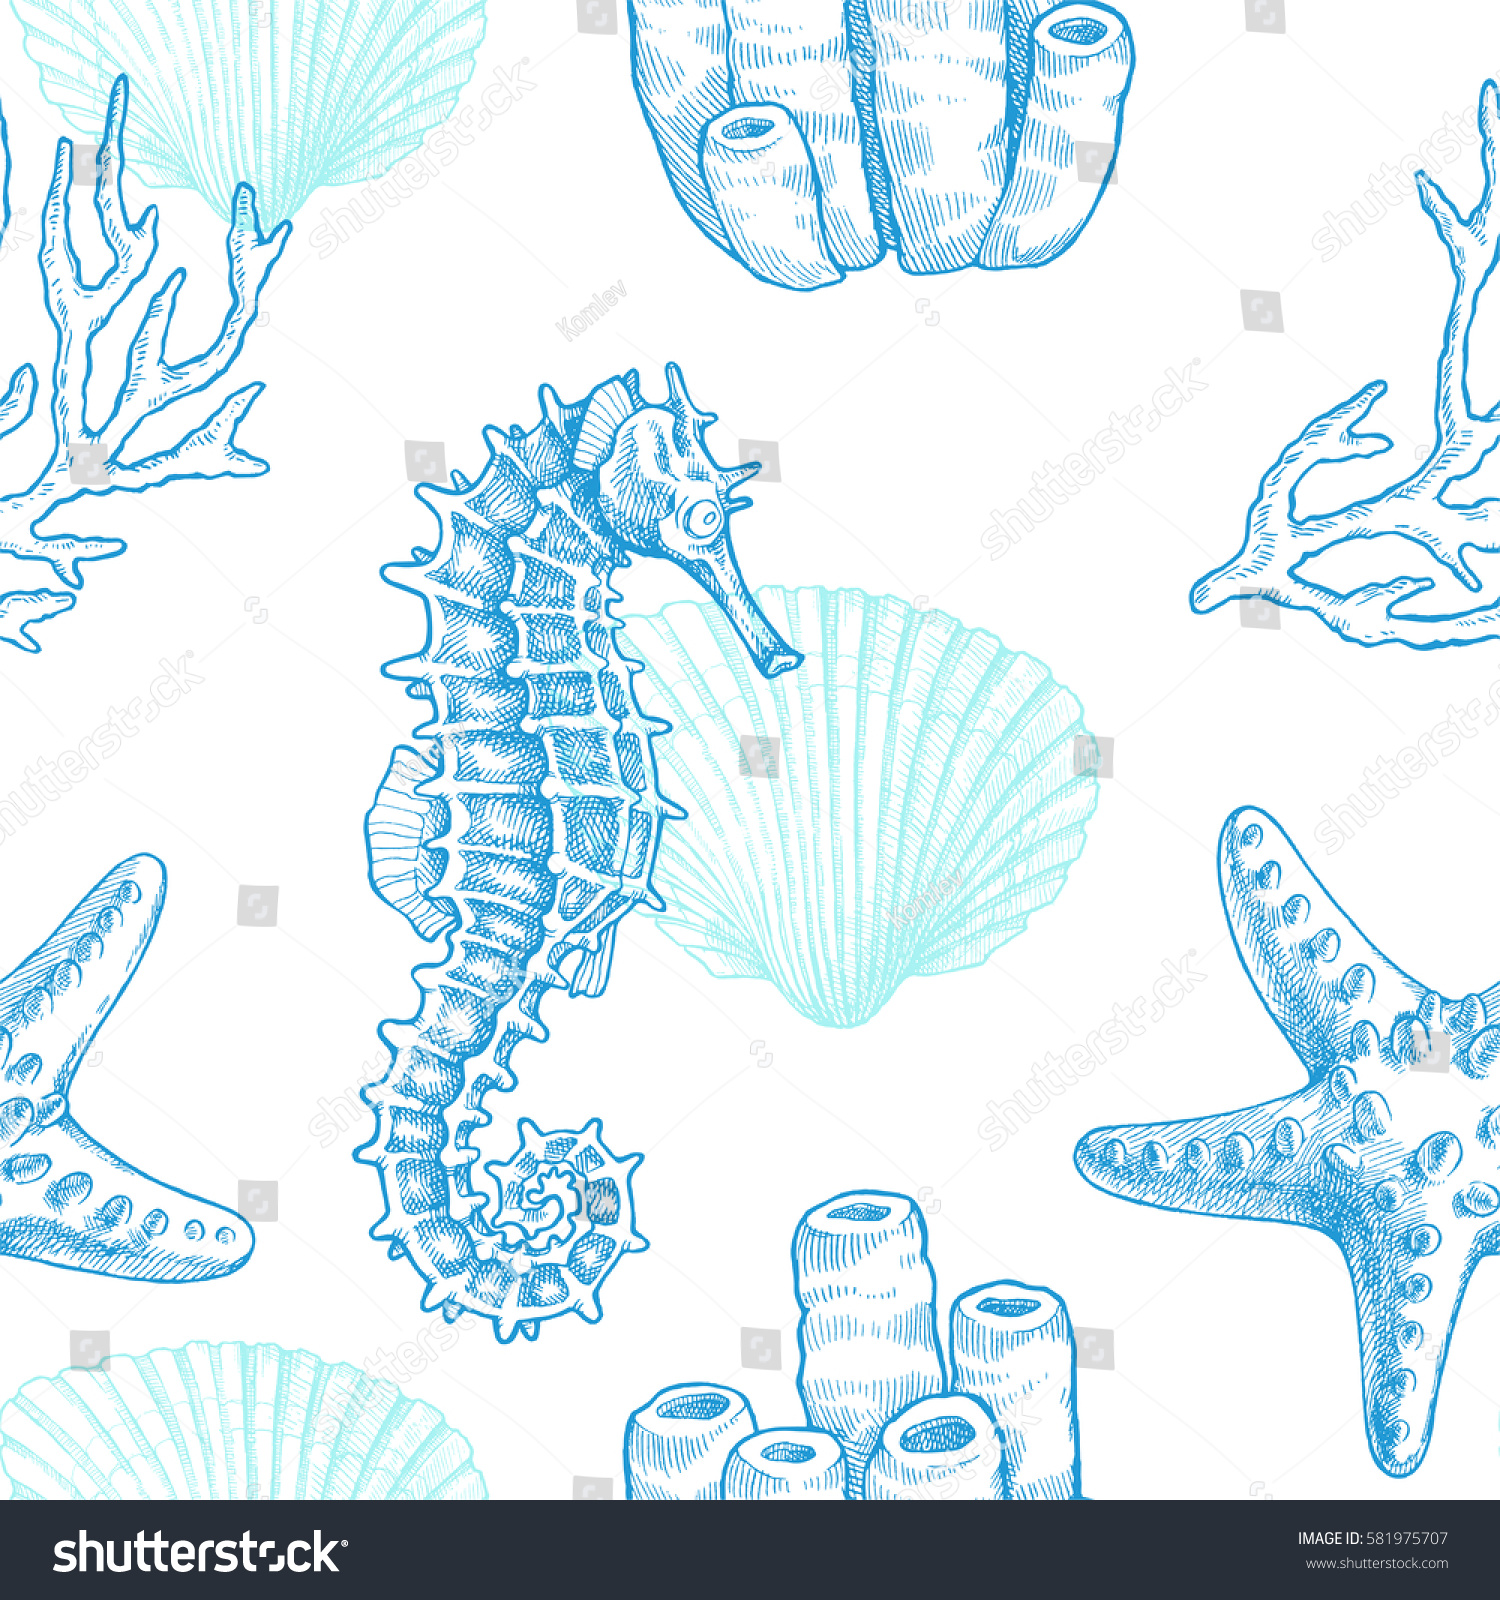 Sea life. Vector hand drawn vintage illustration of seahorse, starfish, coral sprigs and seashell. Marine seamless pattern